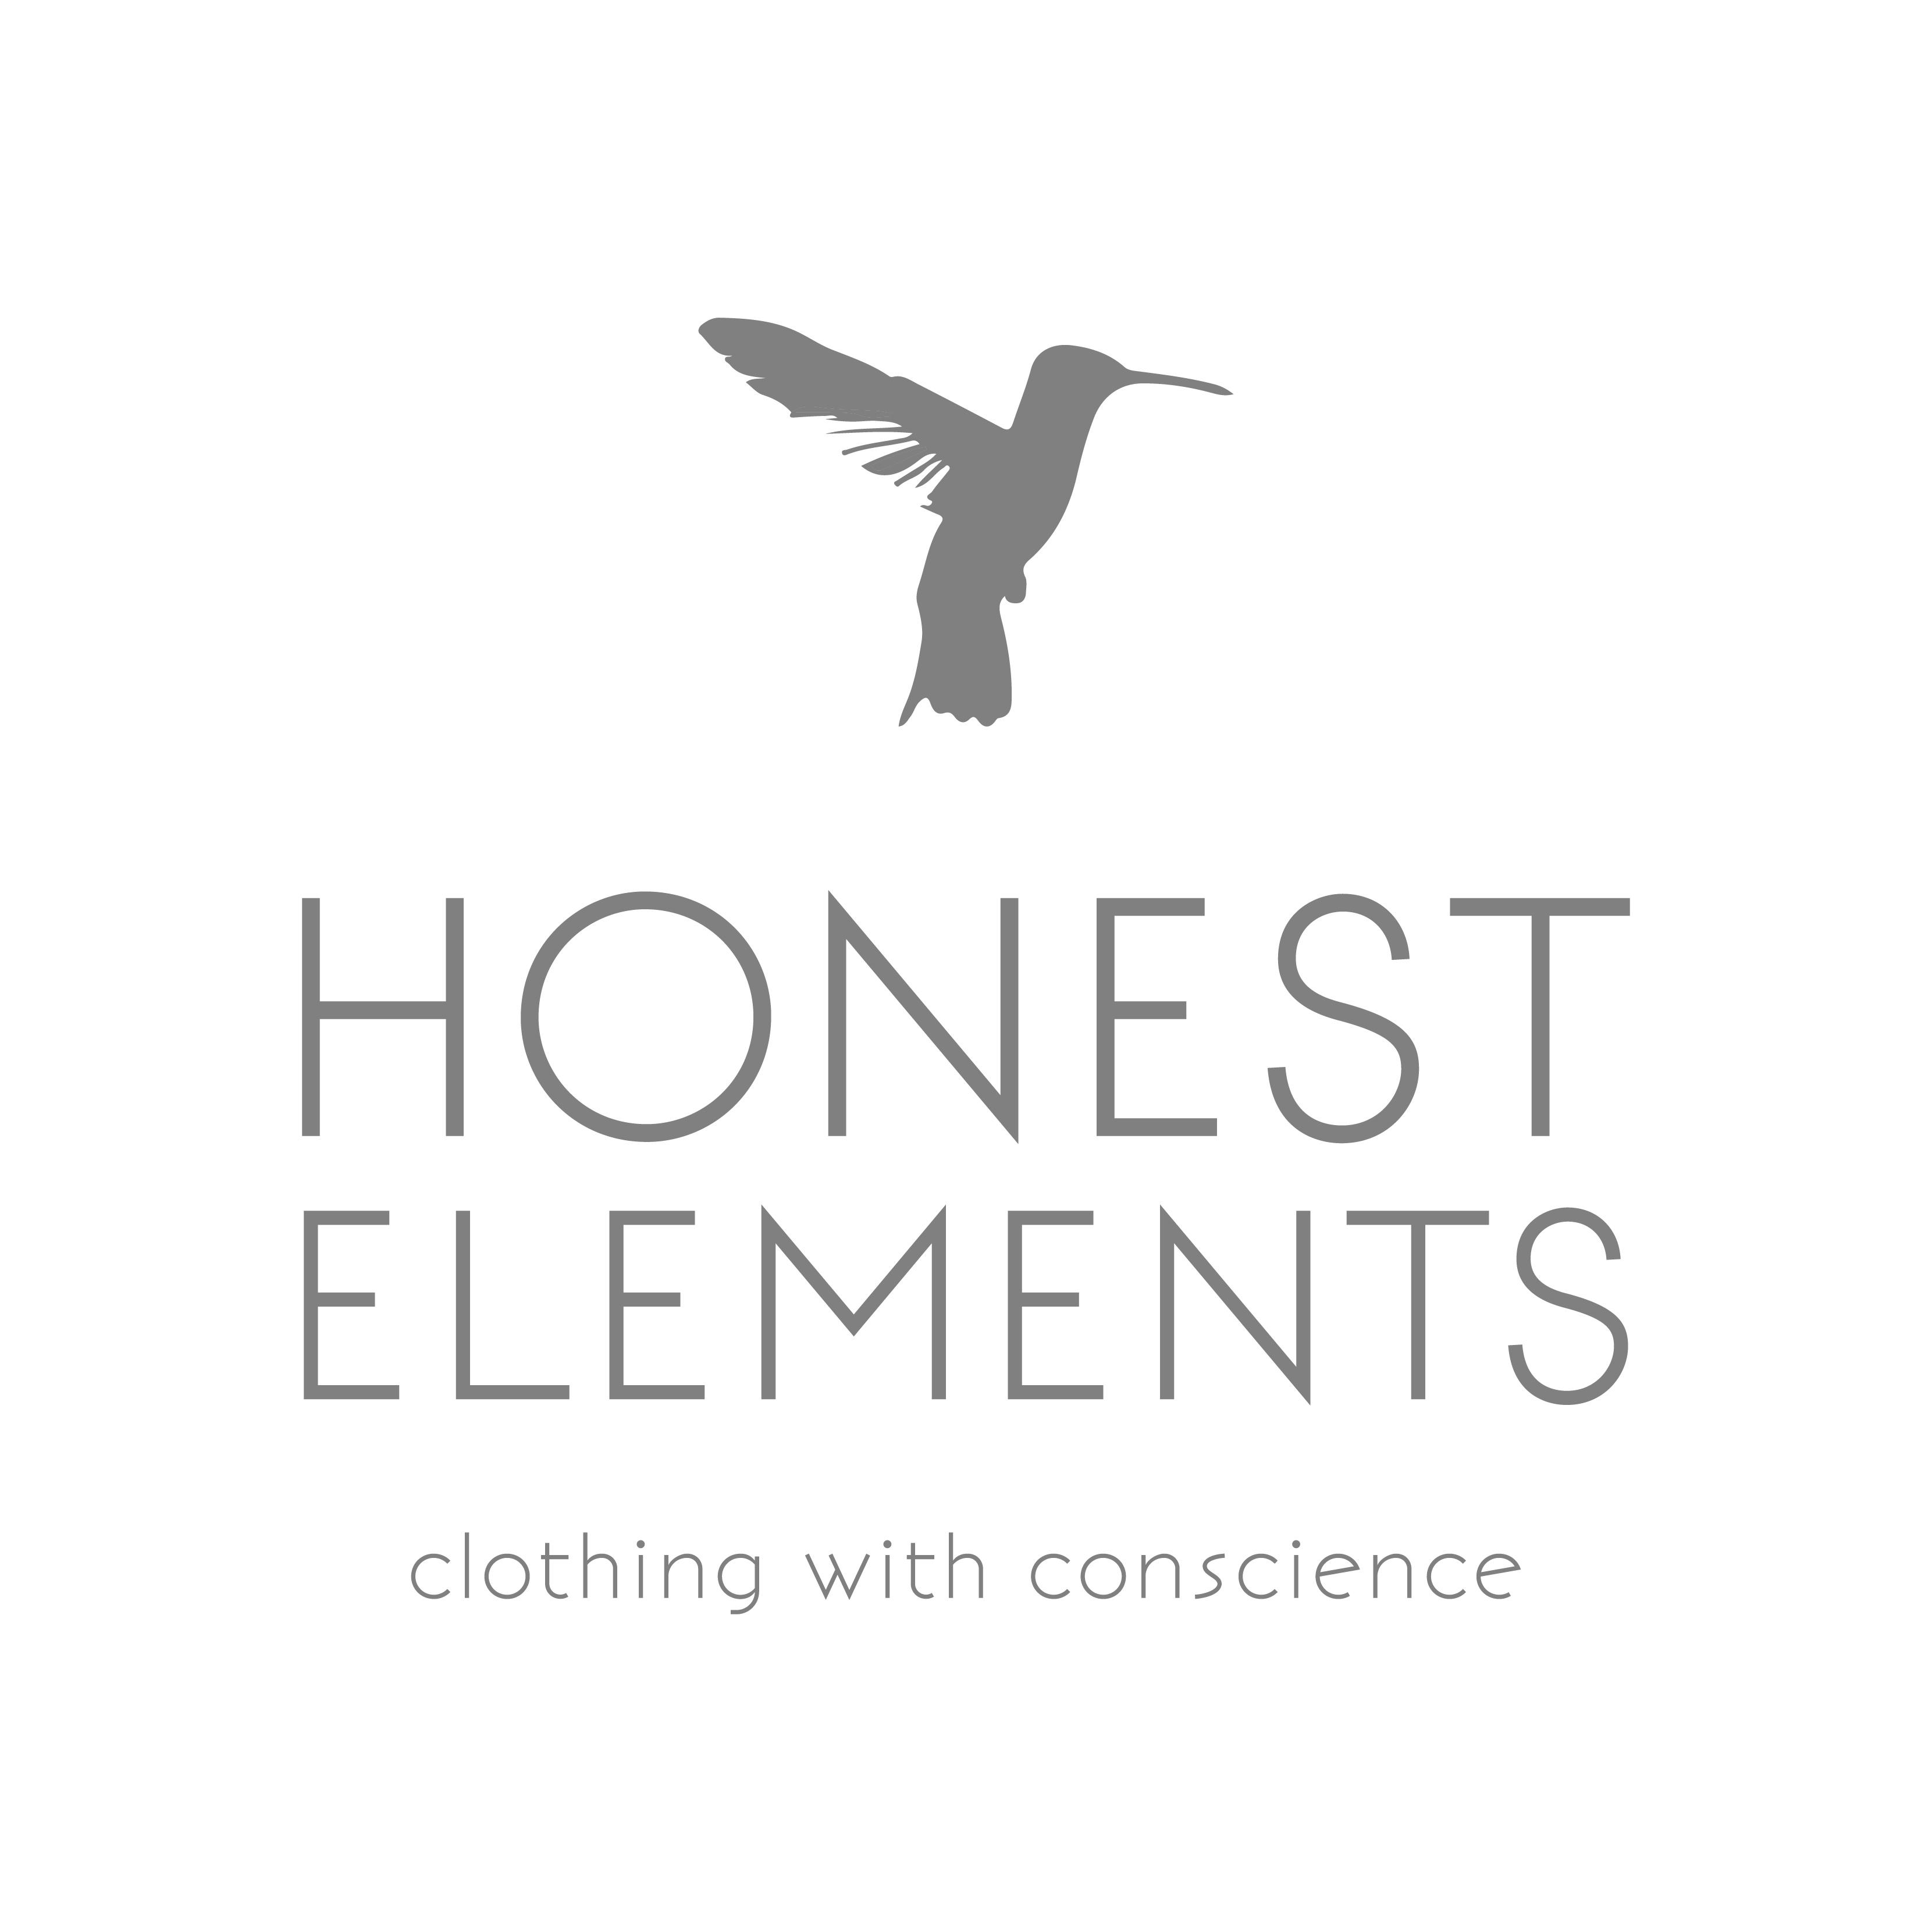 Honest Elements